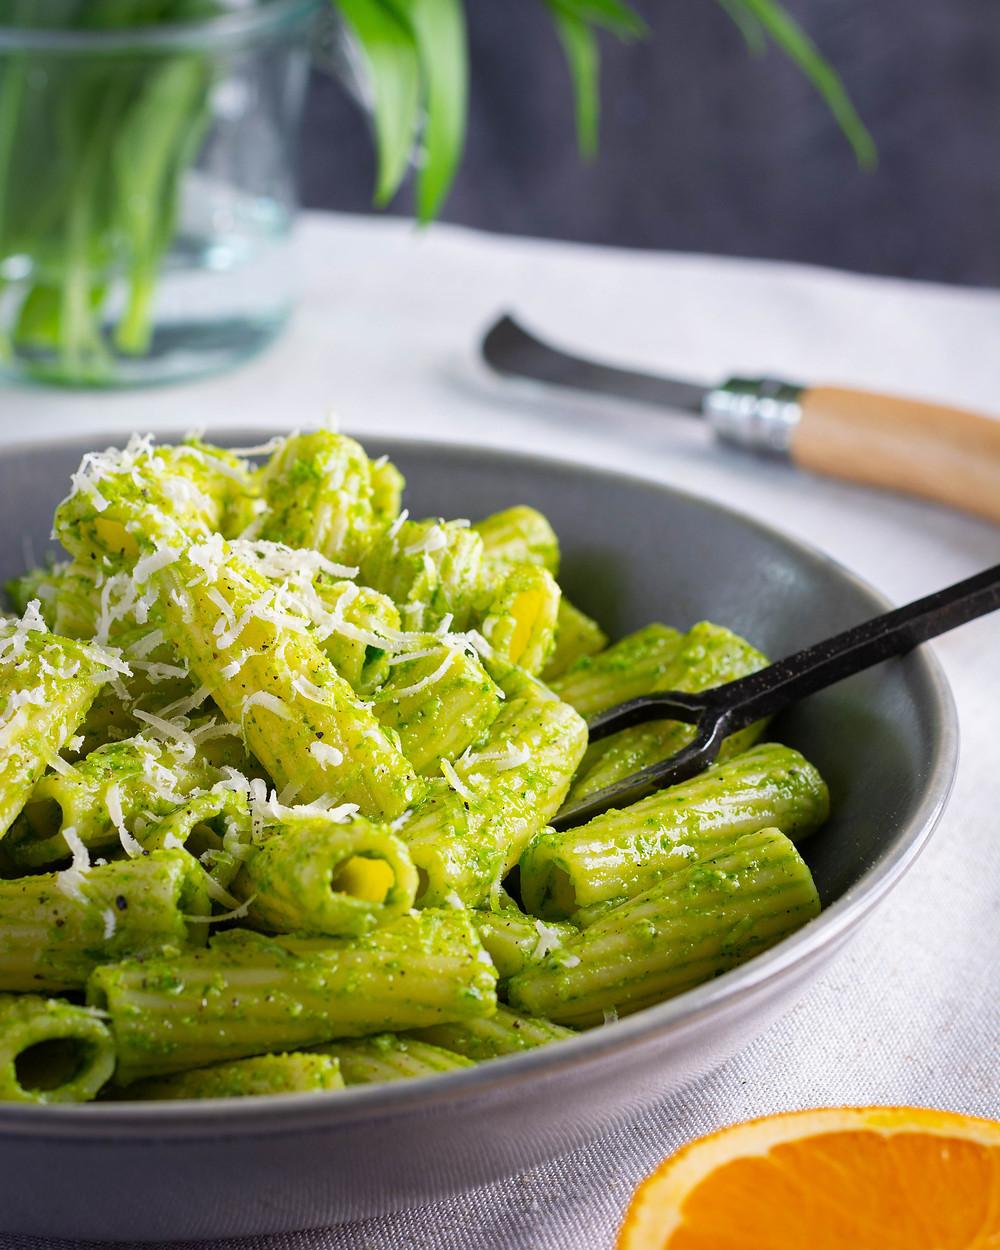 Wild Garlic Pesto & Orange Rigatoni in the bowl